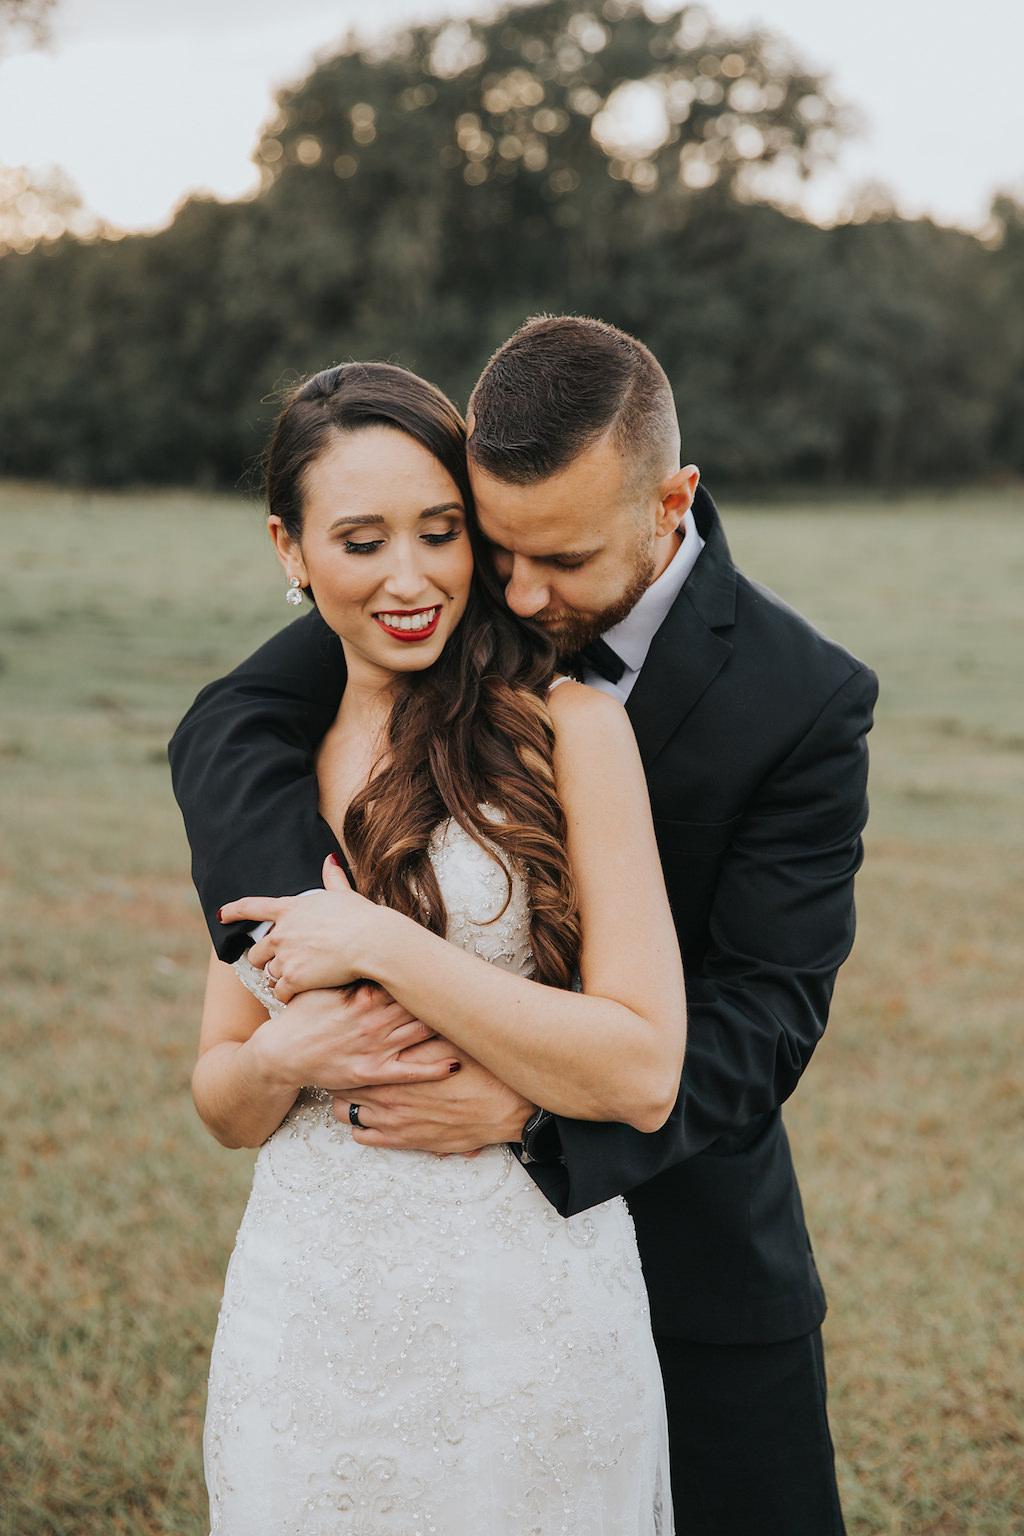 Tampa Bay Bride and Groom Wedding Portrait, White Wedding ...